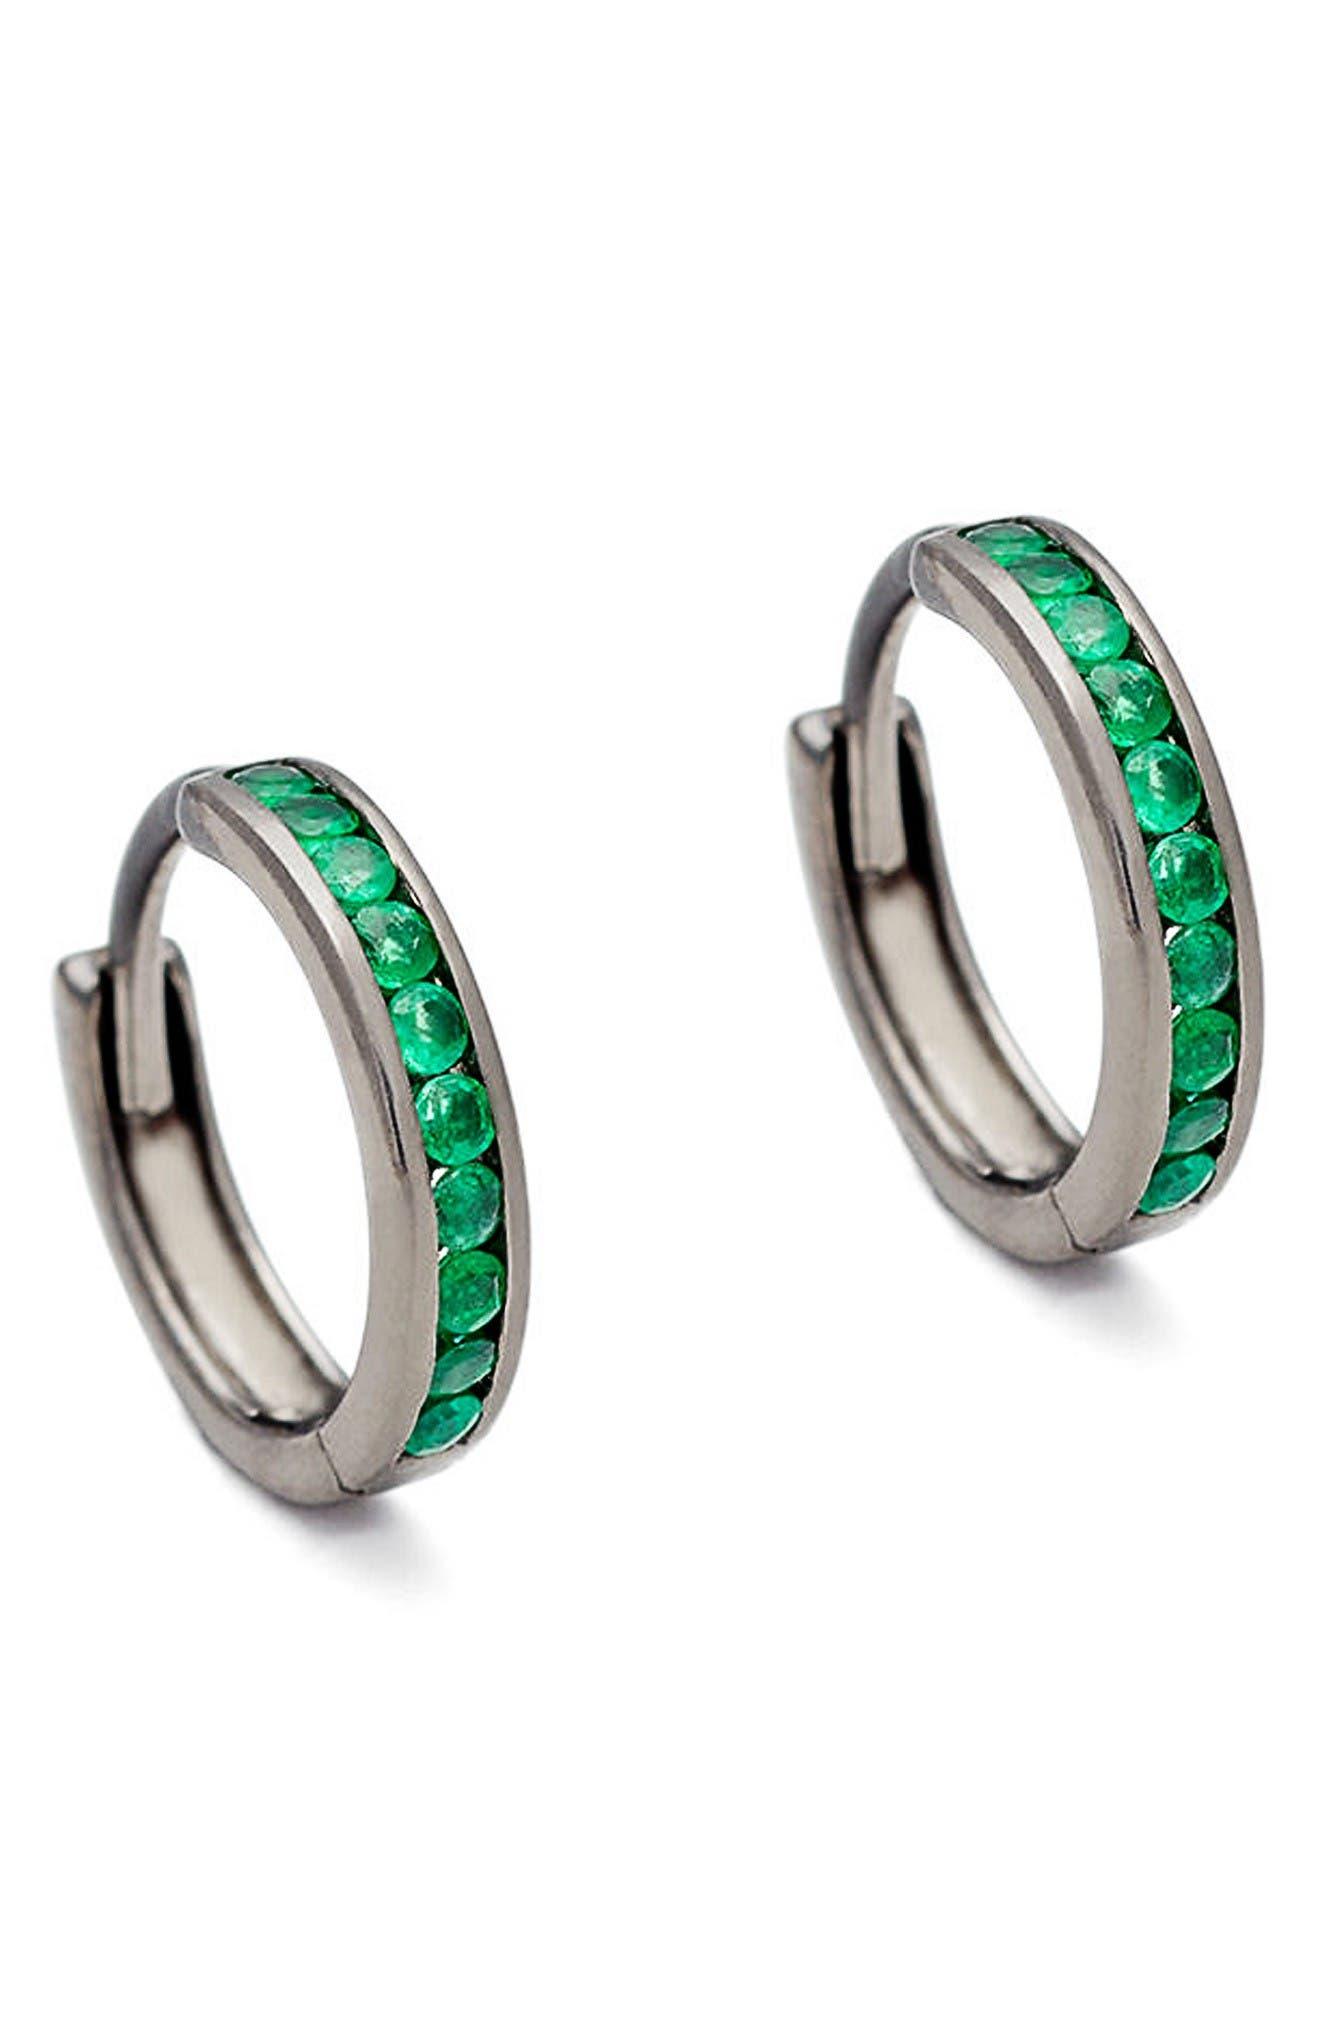 Licol Emerald Hoop Earrings,                         Main,                         color, Silver Green